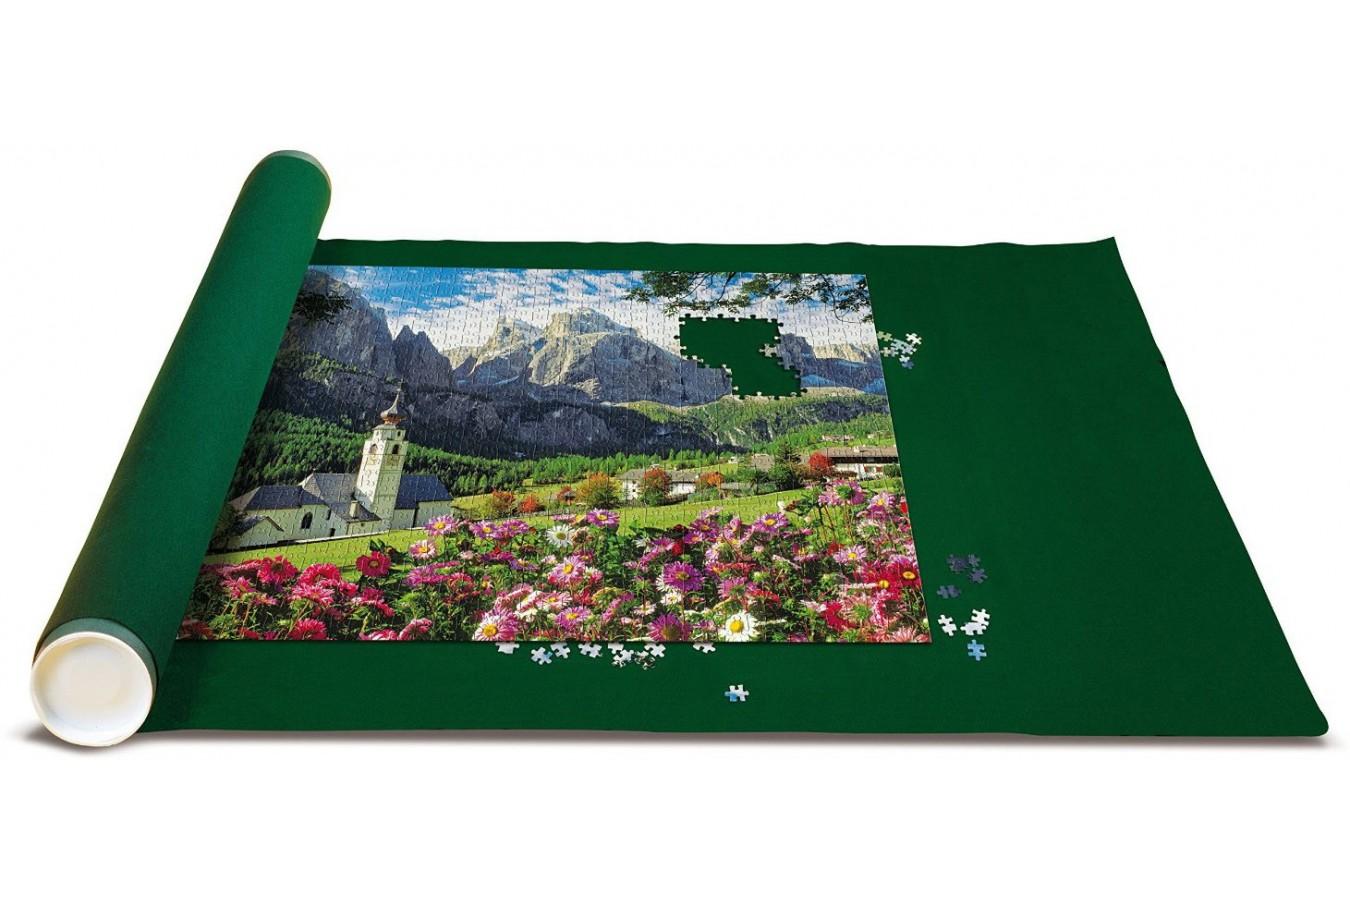 Covor Pentru Puzzle King, 300-1000 Piese + Puzzle The Dolomites, 1000 piese (05016) imagine